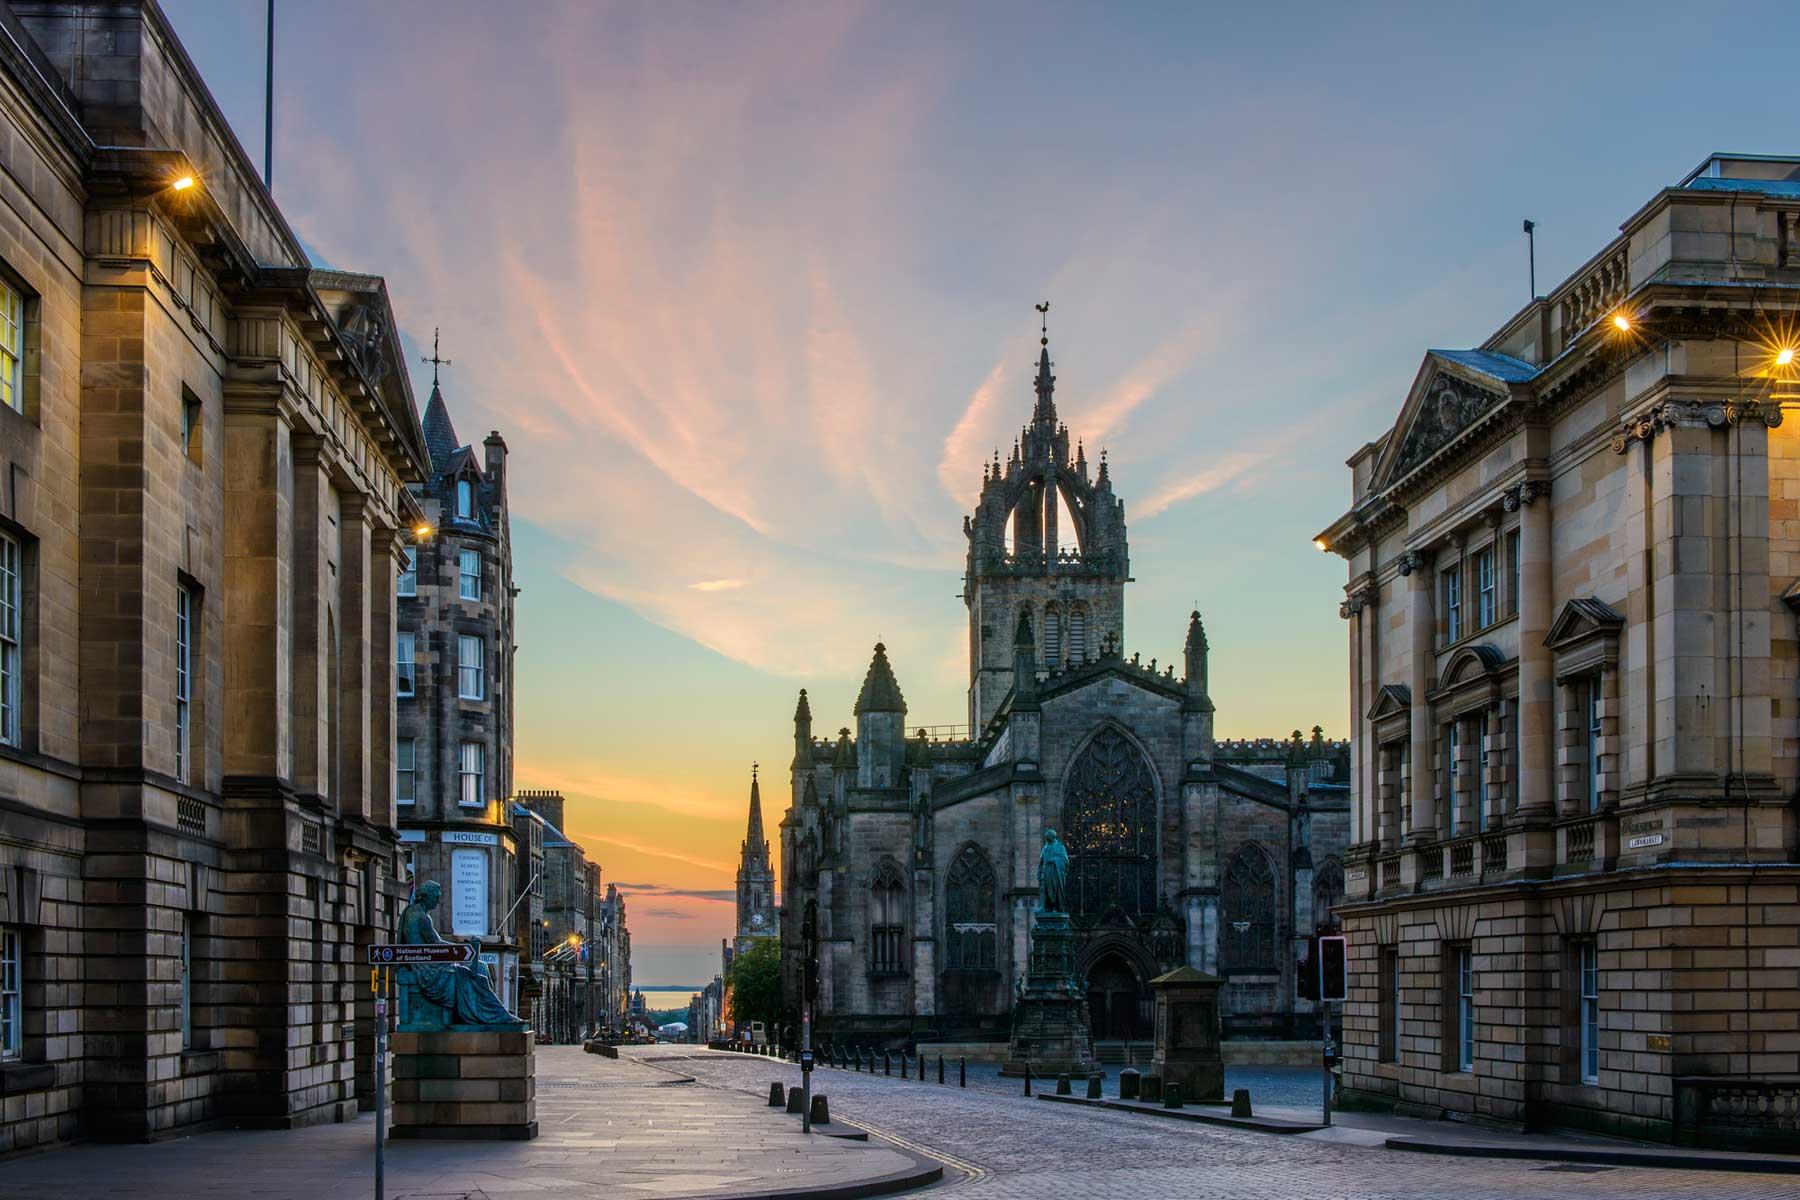 que ver en Edimburgo en 3 dias